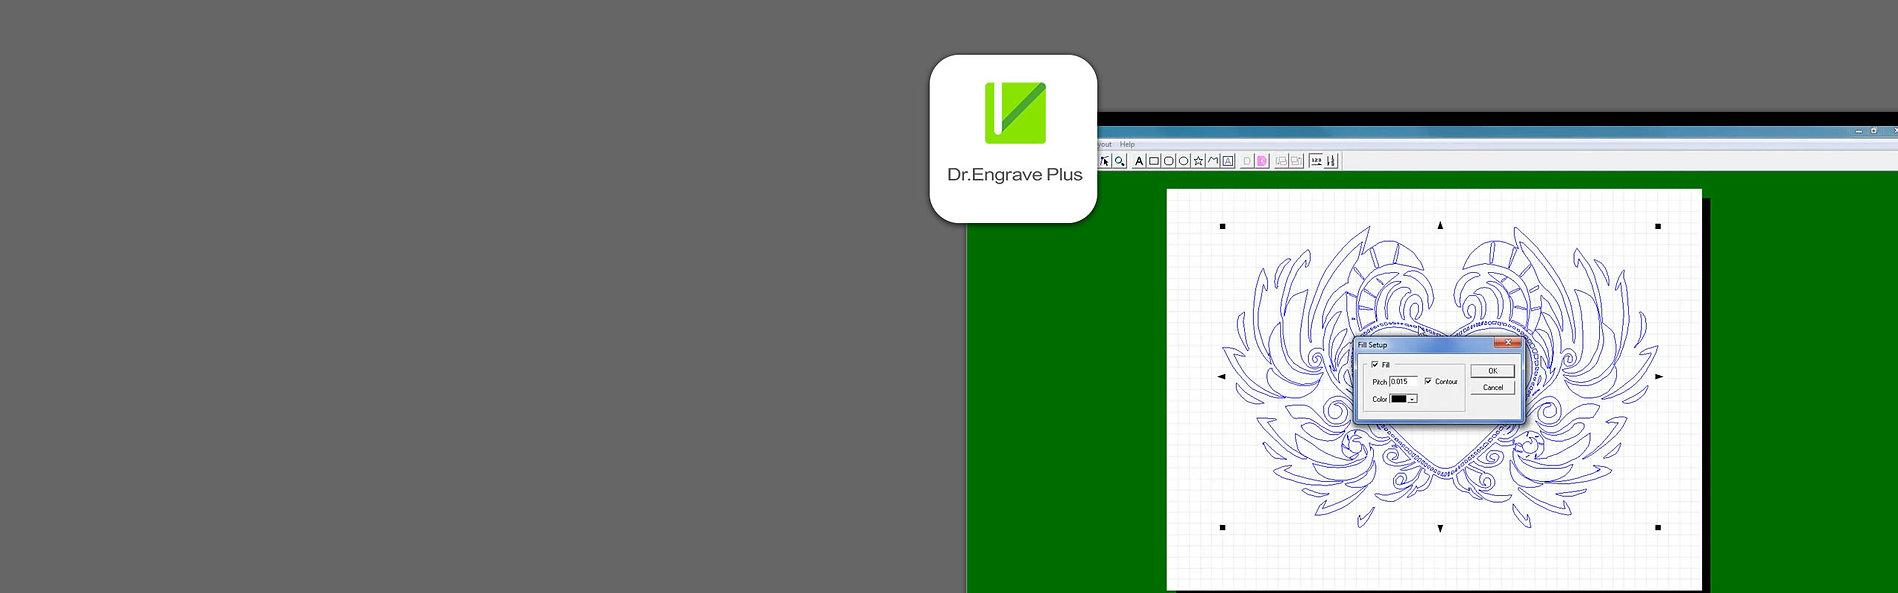 softwarebackground_02.jpg